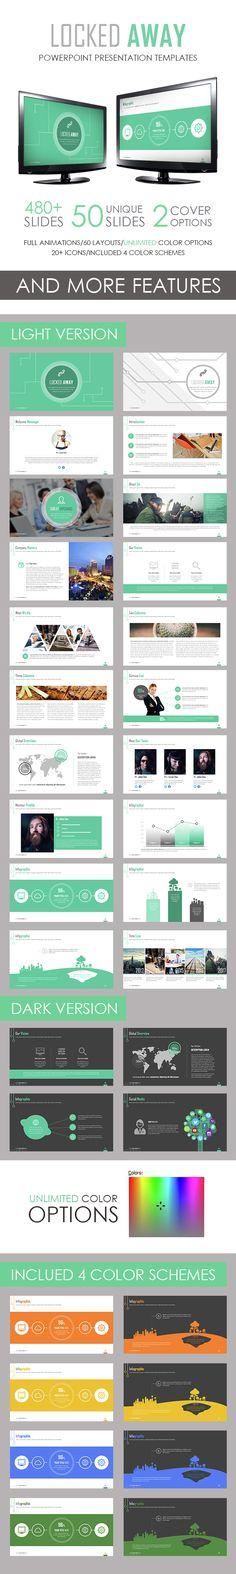 Locked Away Powerpoint Template. Download here: http://graphicriver.net/item/locked-away-powerpoint-template/14820331?ref=ksioks